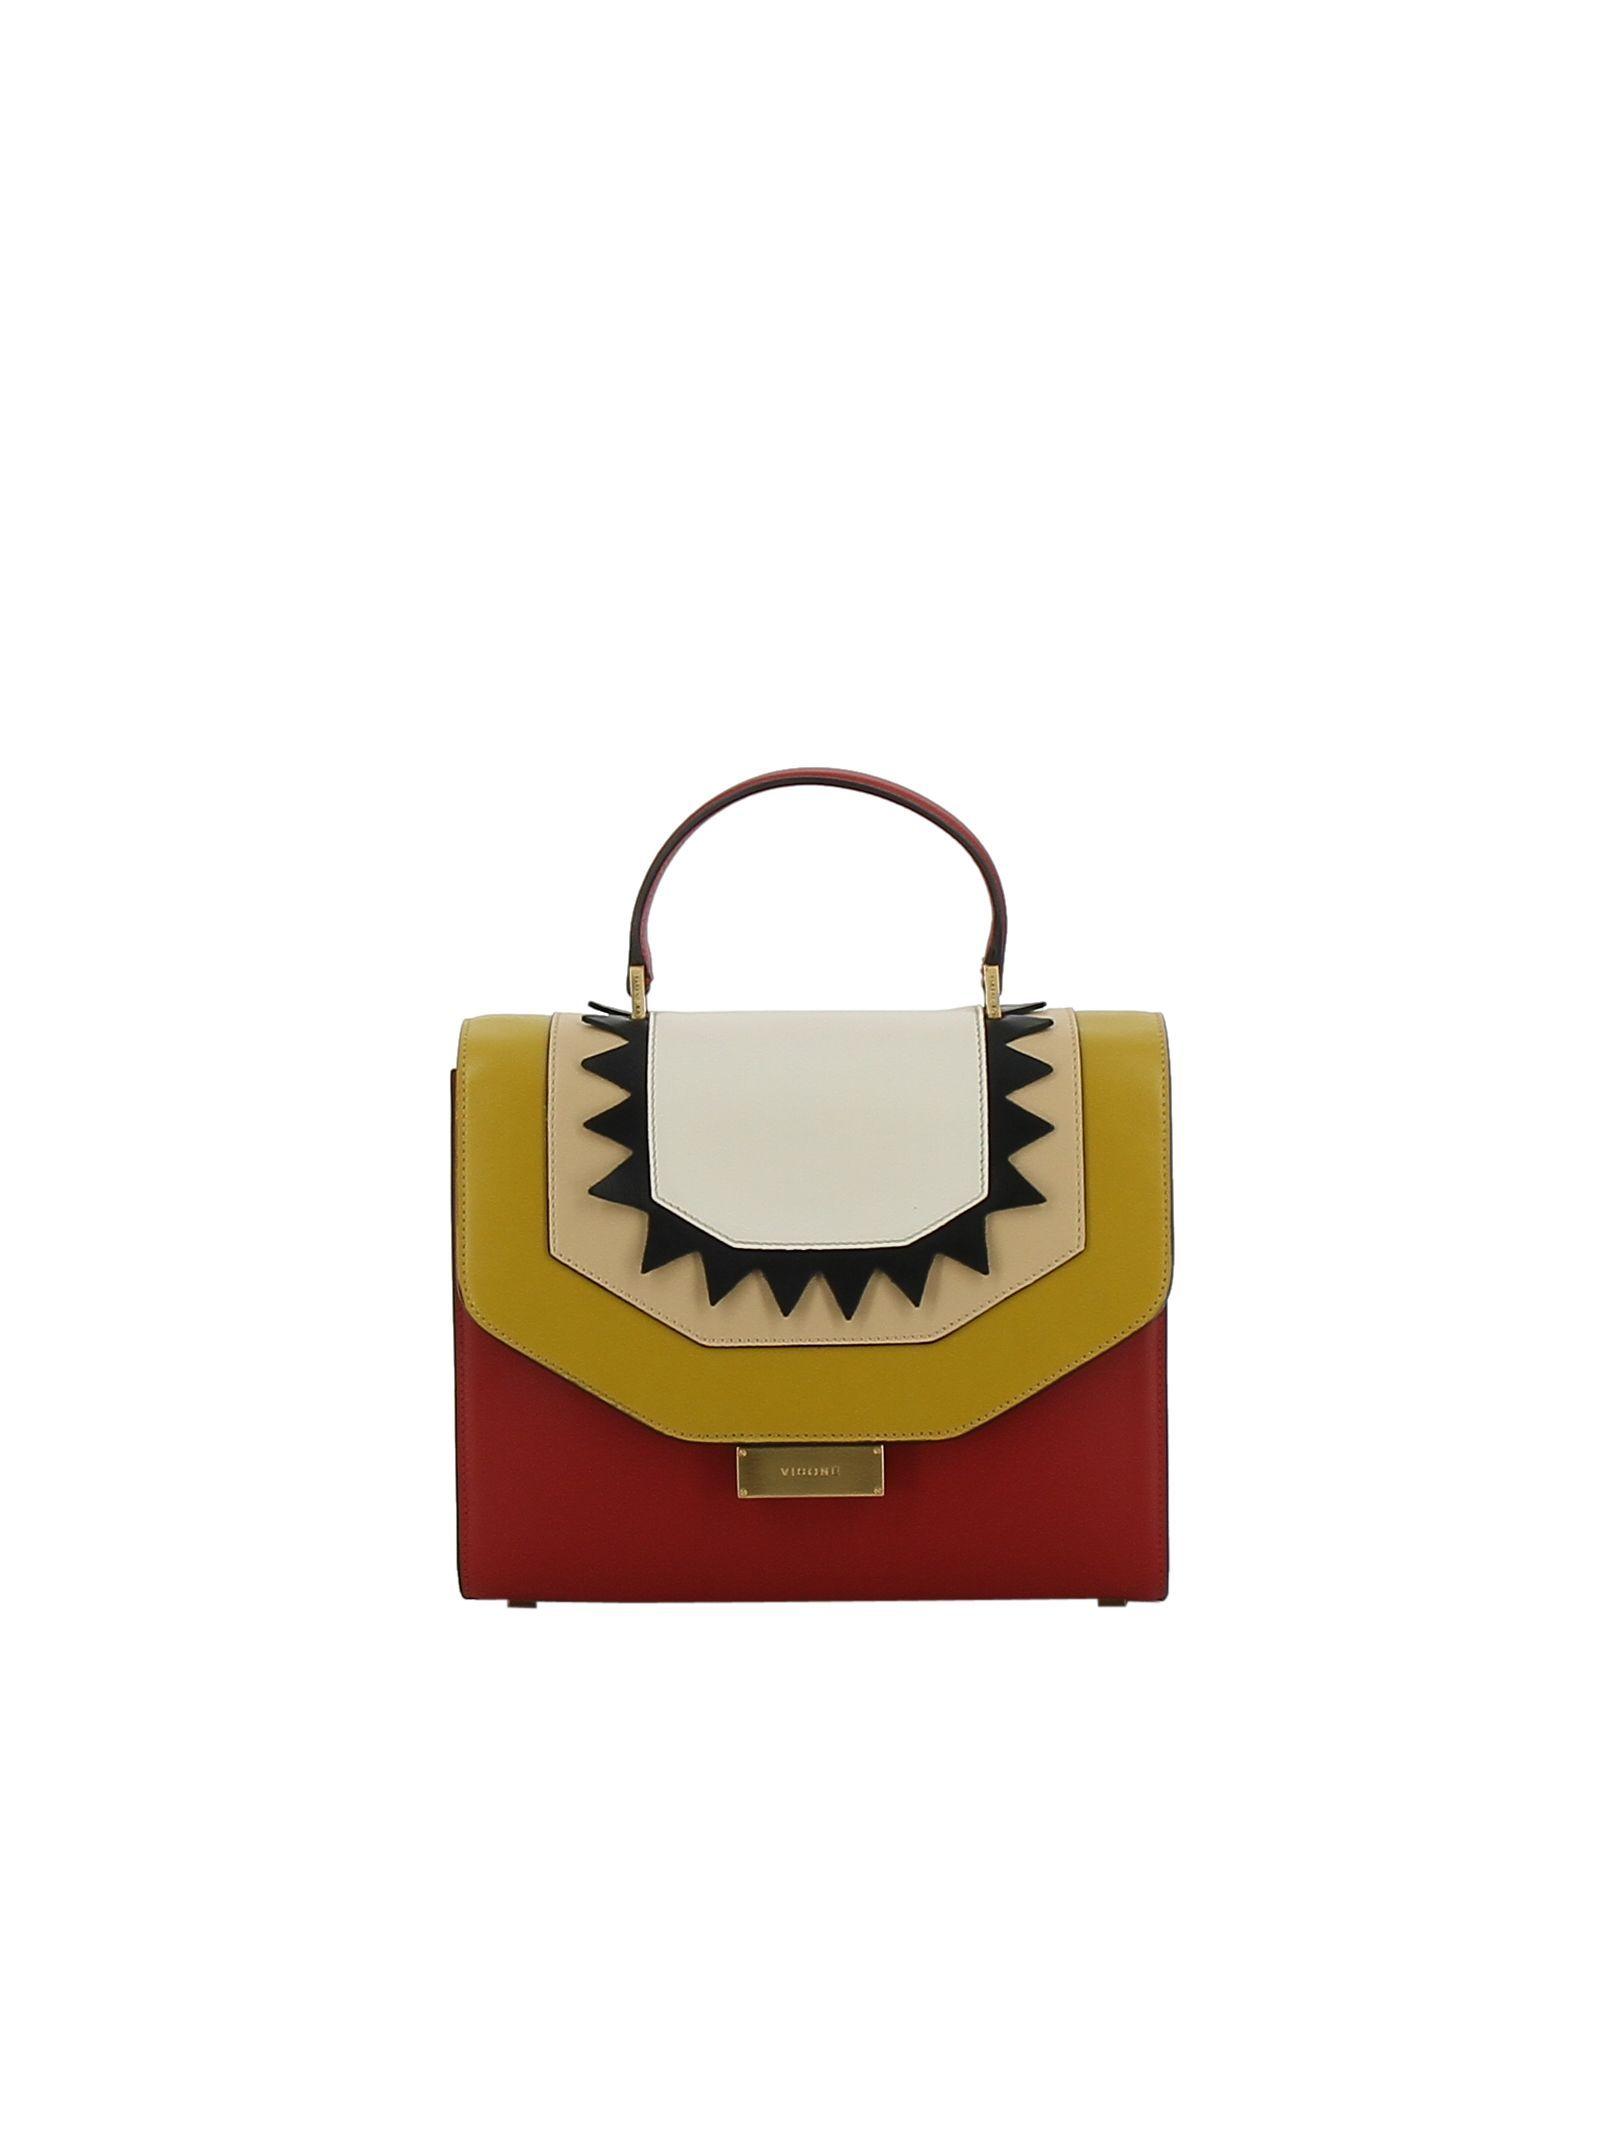 visone Angie bags Visone hand Bag Shoulder Bags shoulder Medium TIq7aZxqw